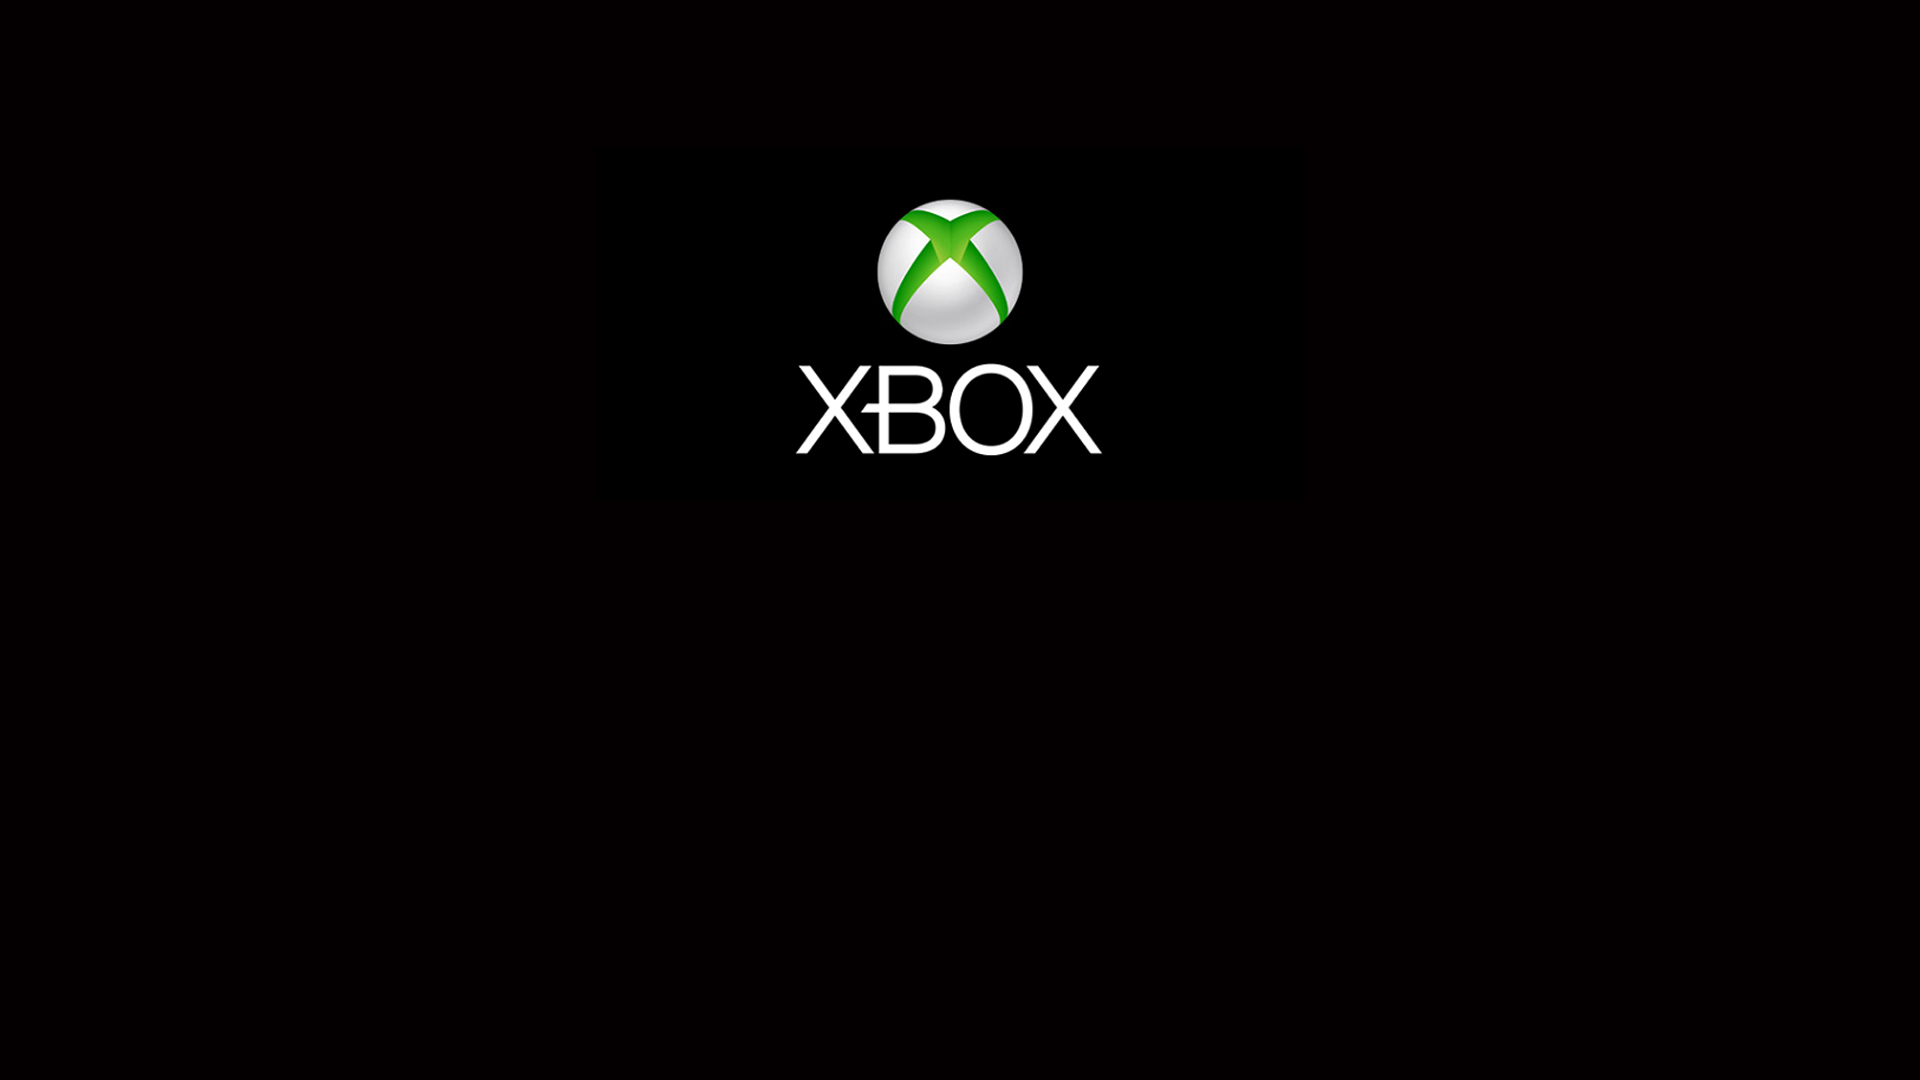 Xbox Wallpaper 14